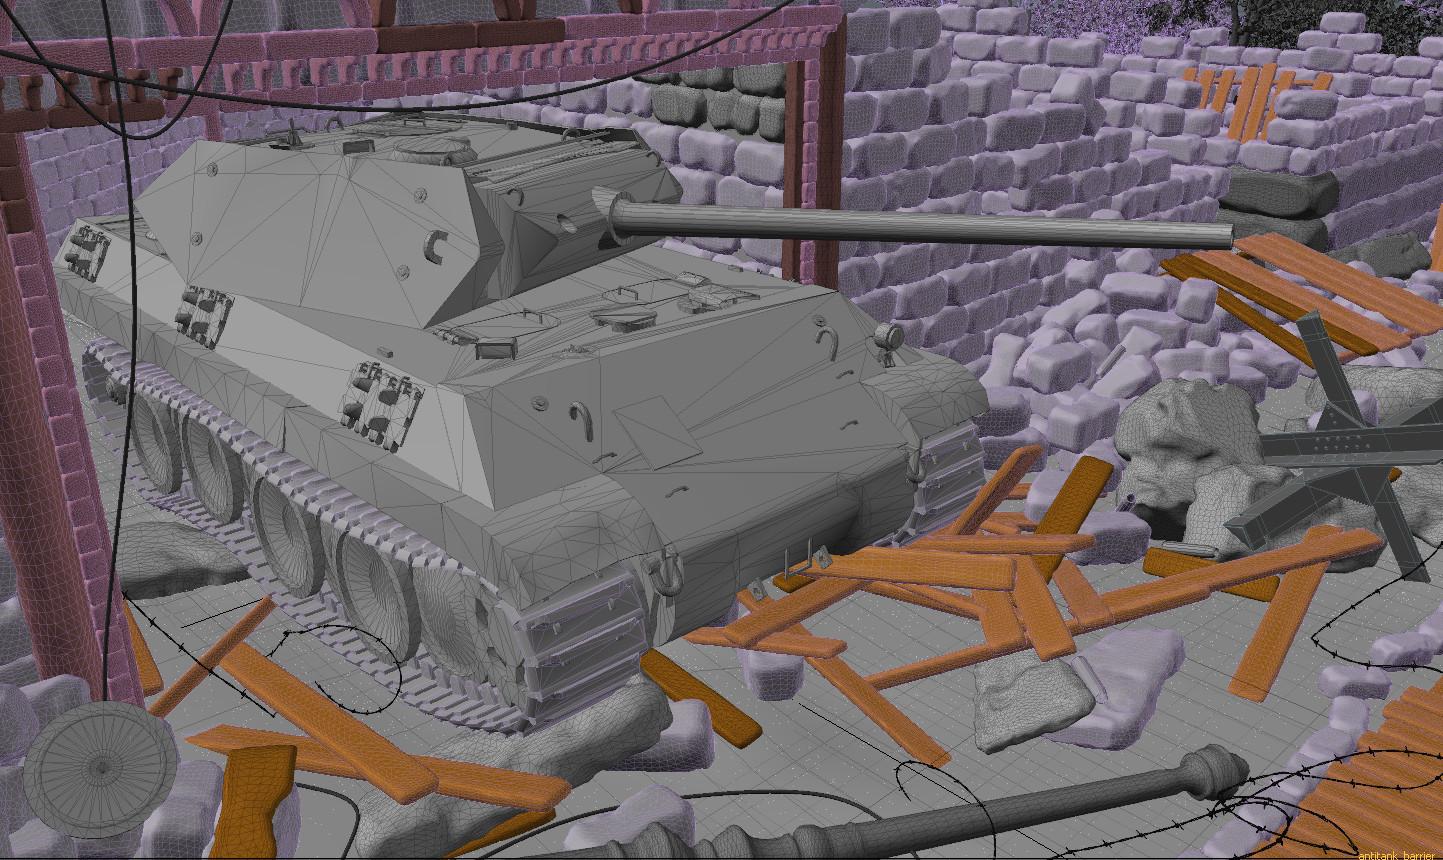 World of Tanks Artwork by Andrey Sarafanov